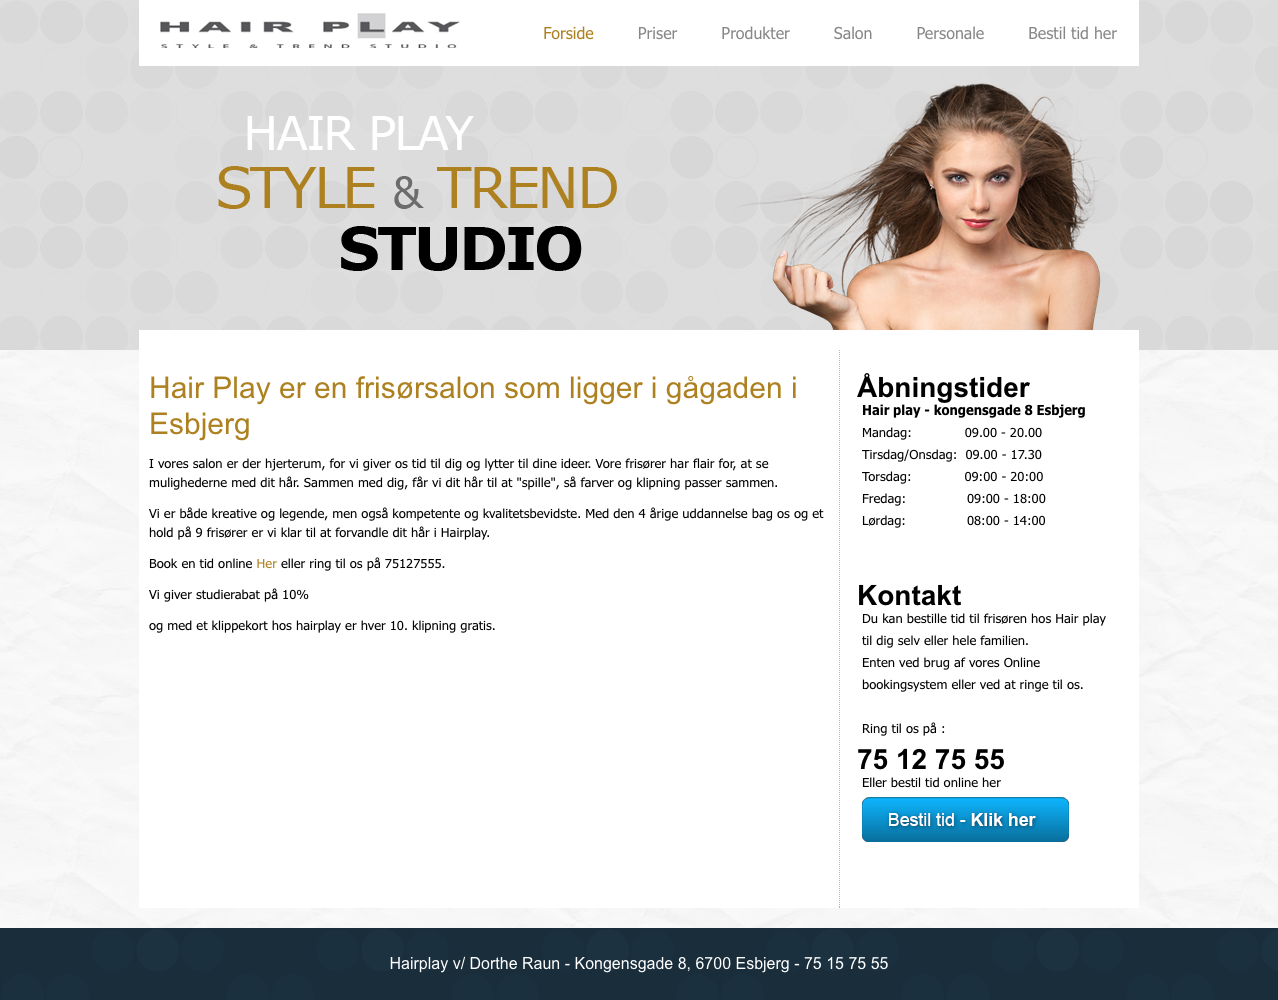 Frisør i Esbjerg - Hairplay frisørsalon i